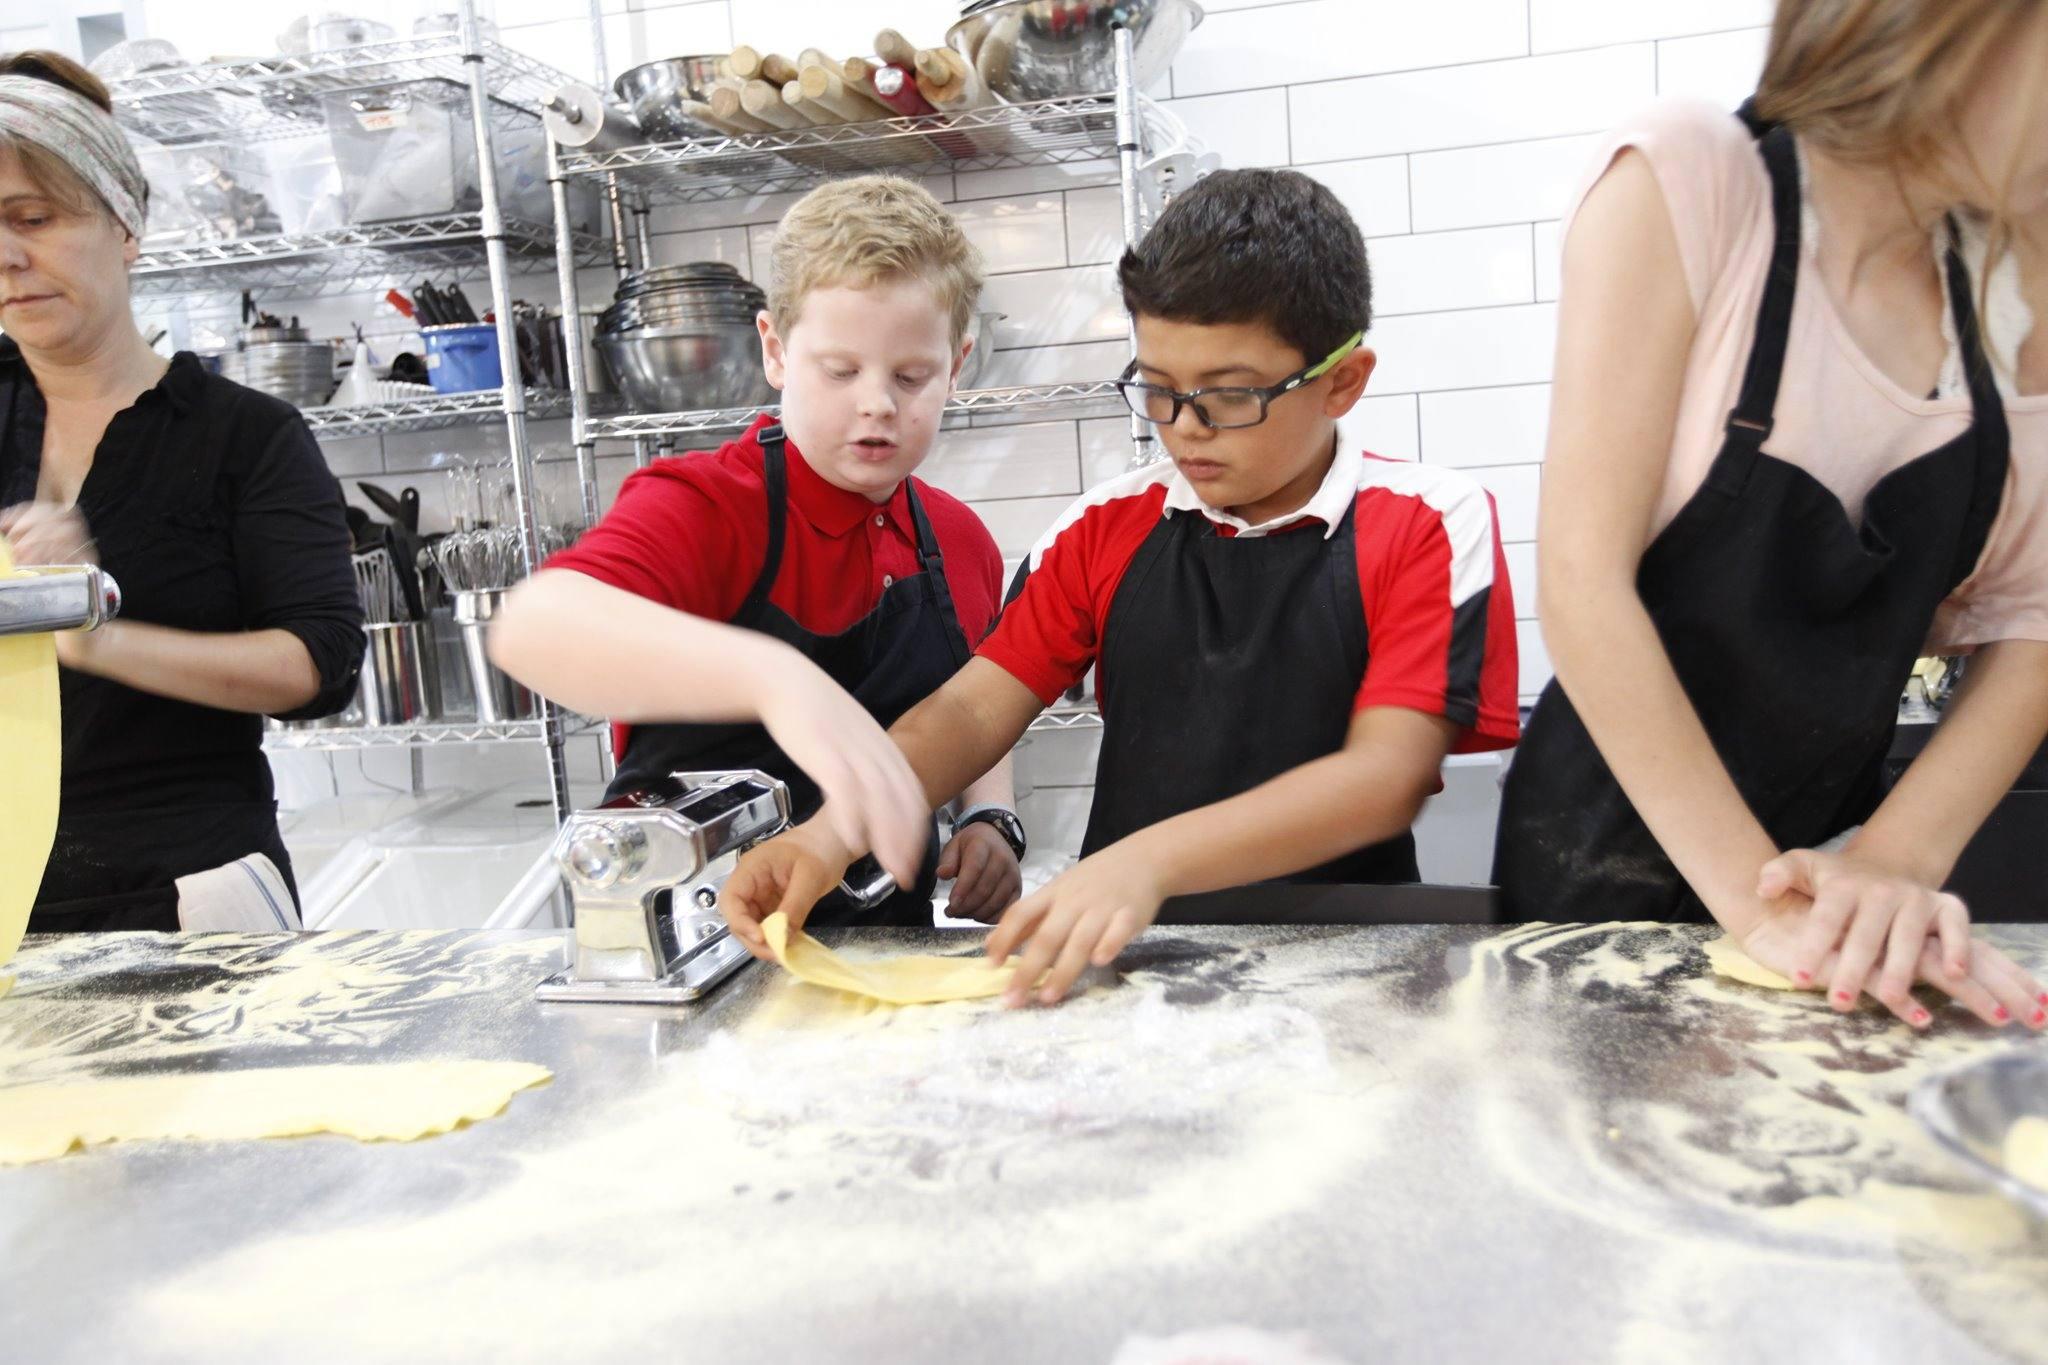 Boys making pasta at The Gourmandise School in Santa Monica